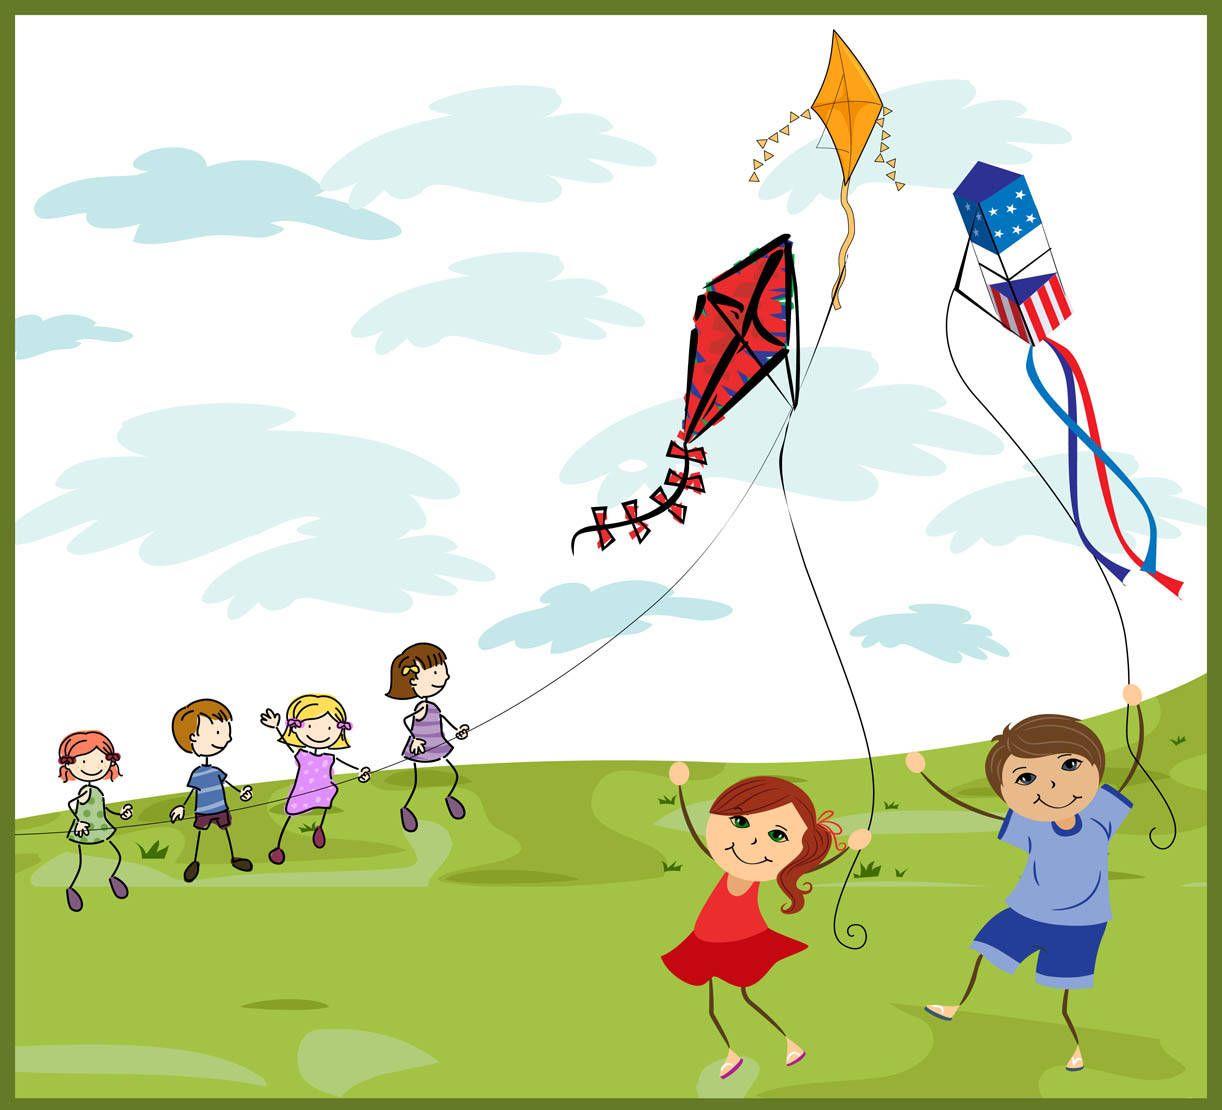 Kites + Clipart = childhood memories rushing back to us!.